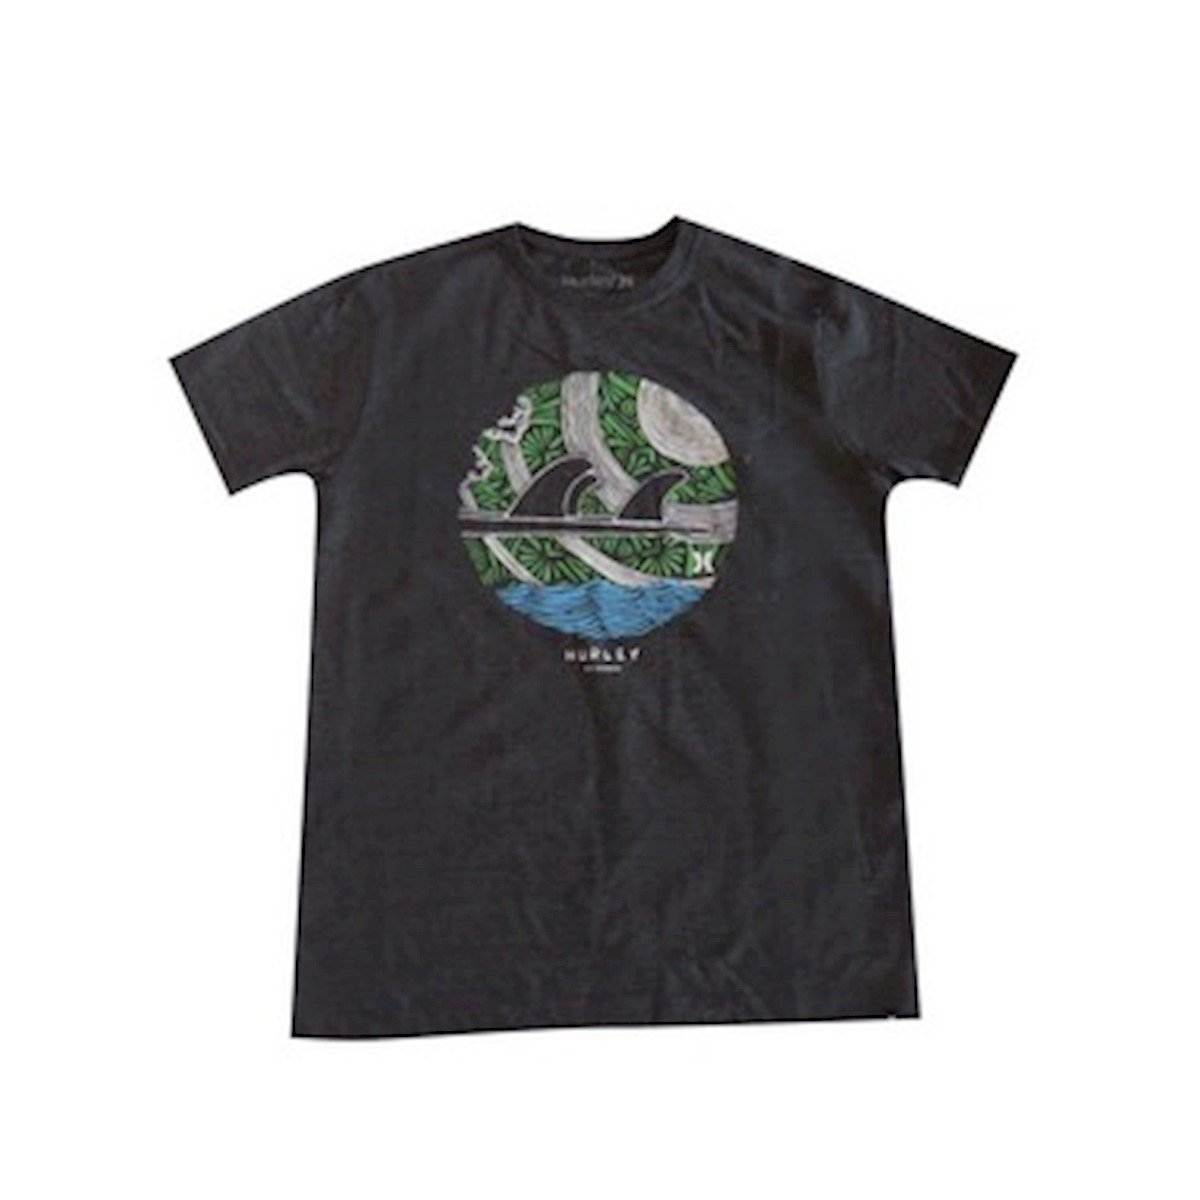 Camiseta Juvenil Finset Silk Juvenil Cinza Hurley Camiseta Finset Cinza Silk Camiseta Hurley CXHqwOC